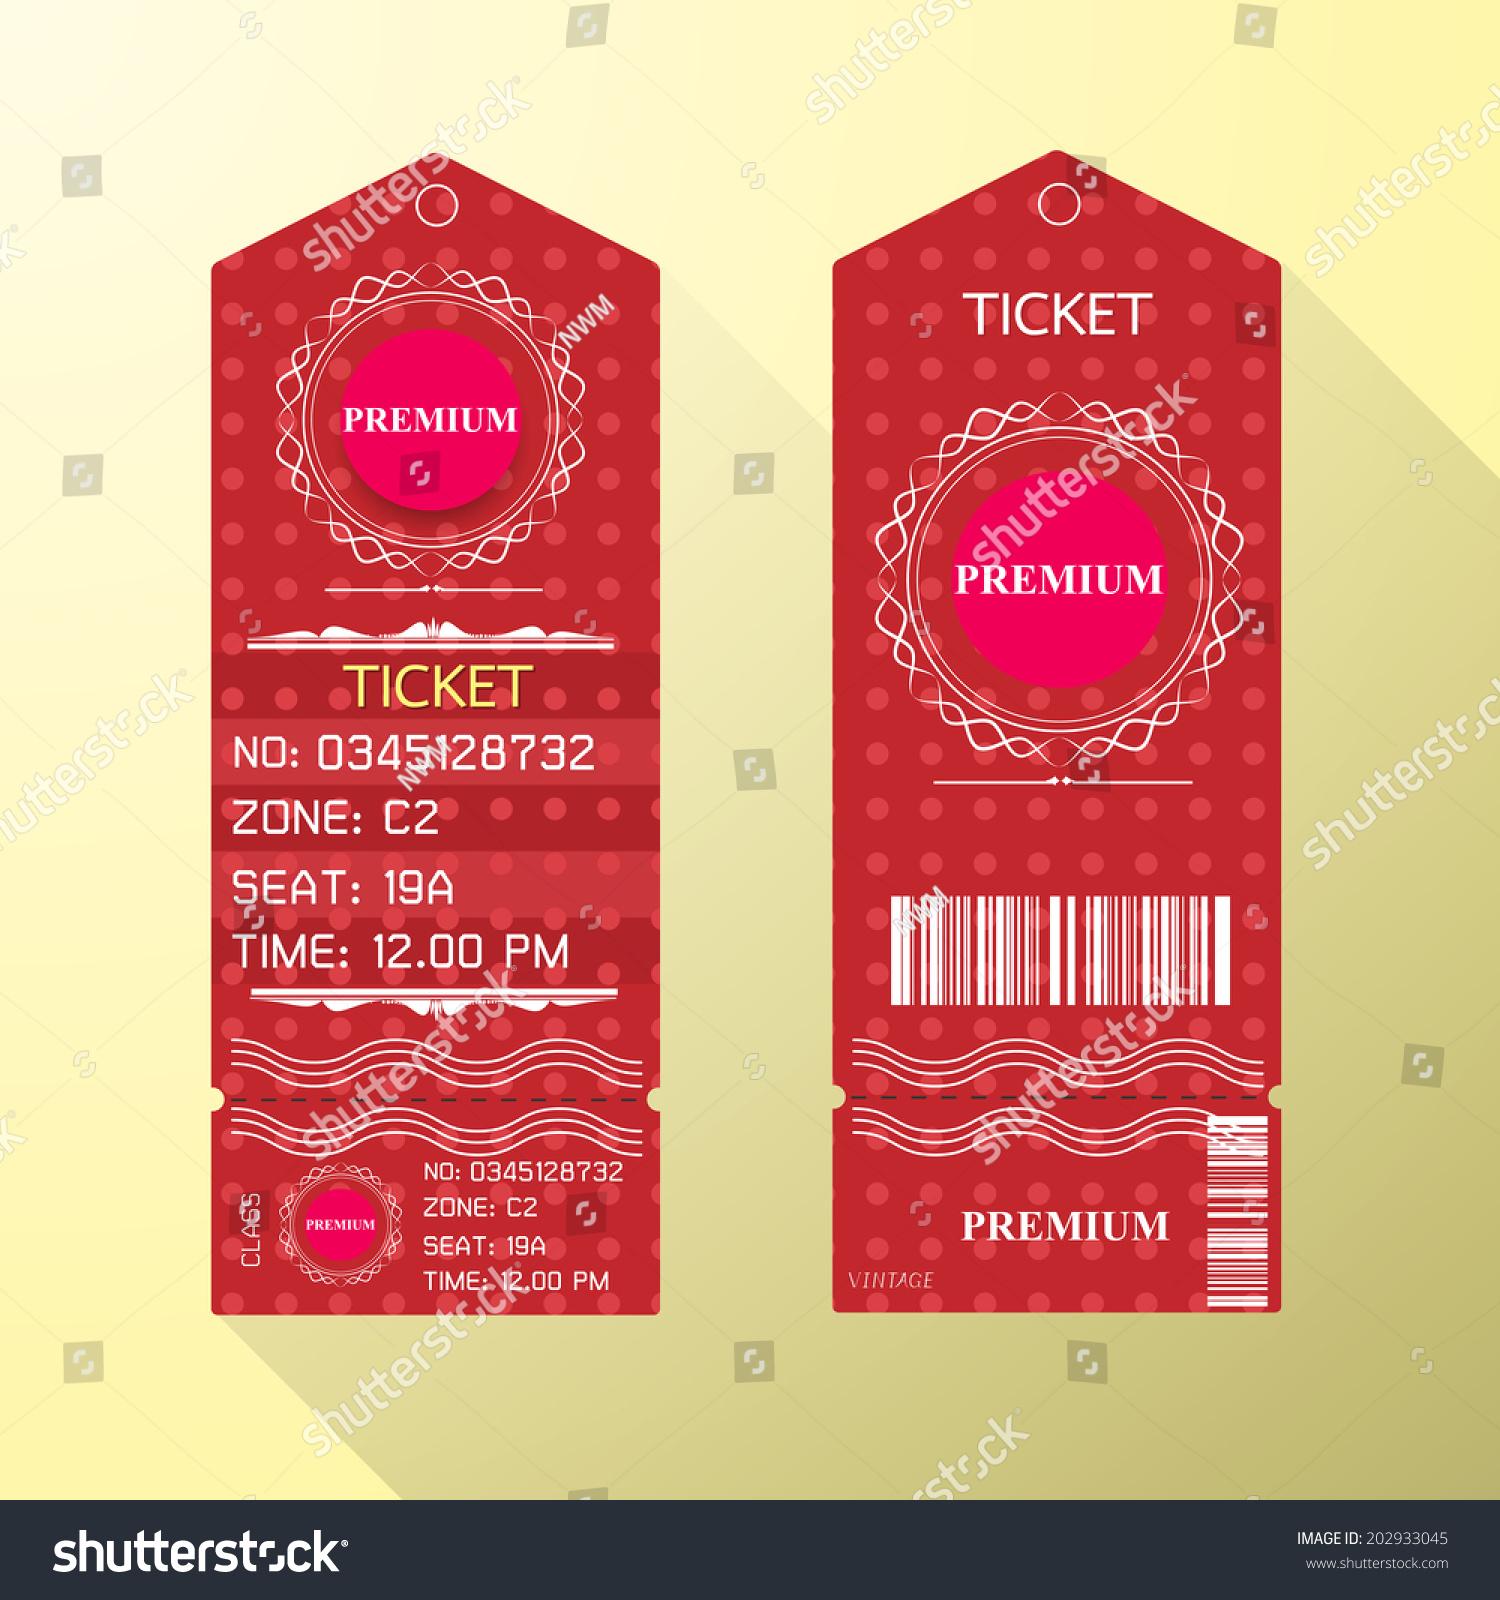 ticket design template free